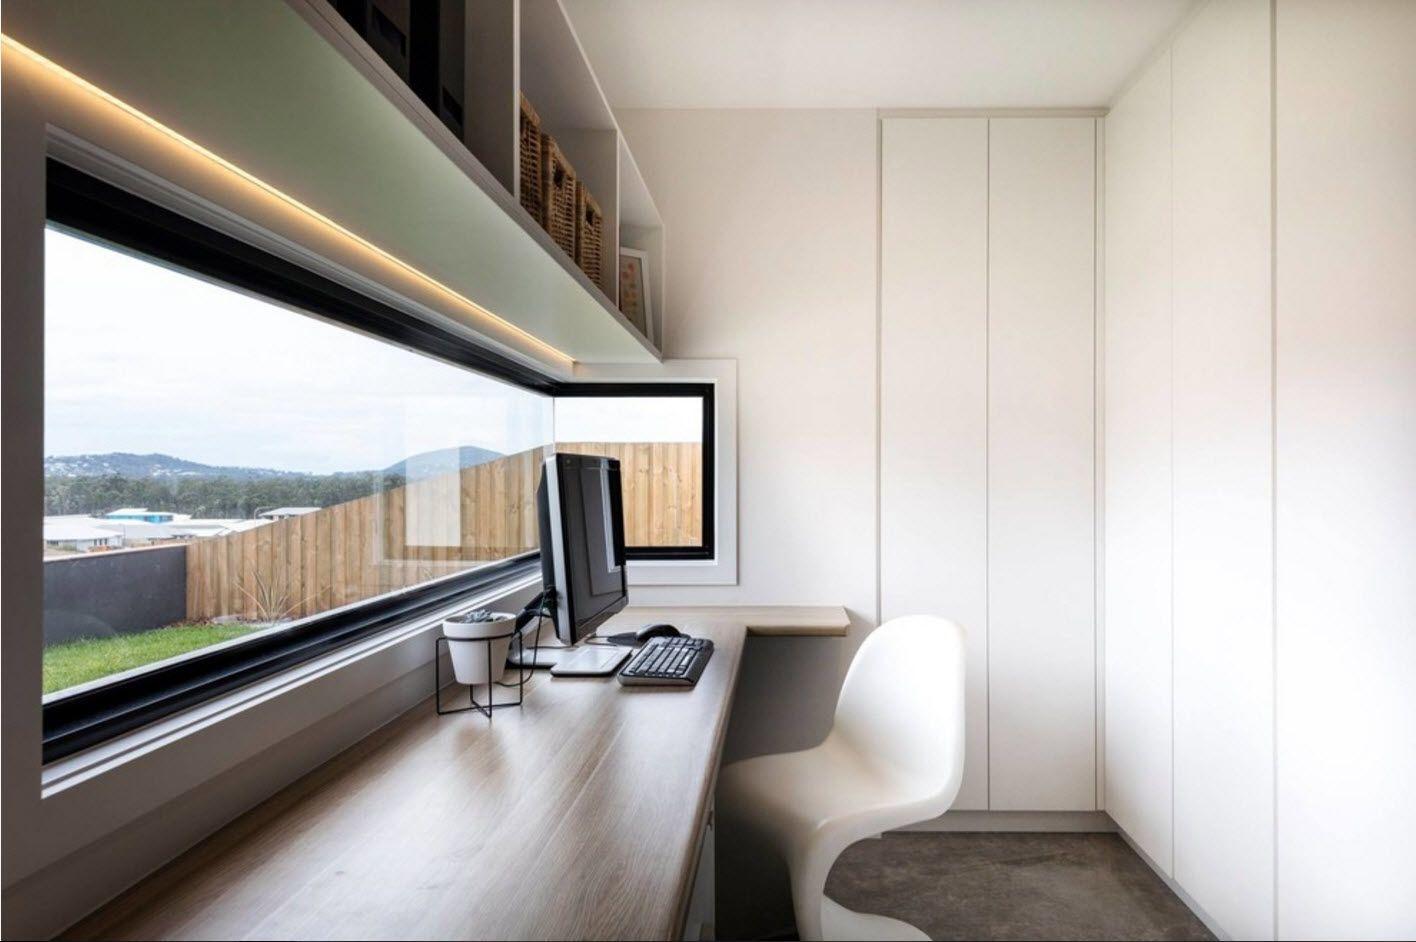 HI-tech design for the modern home office 2017